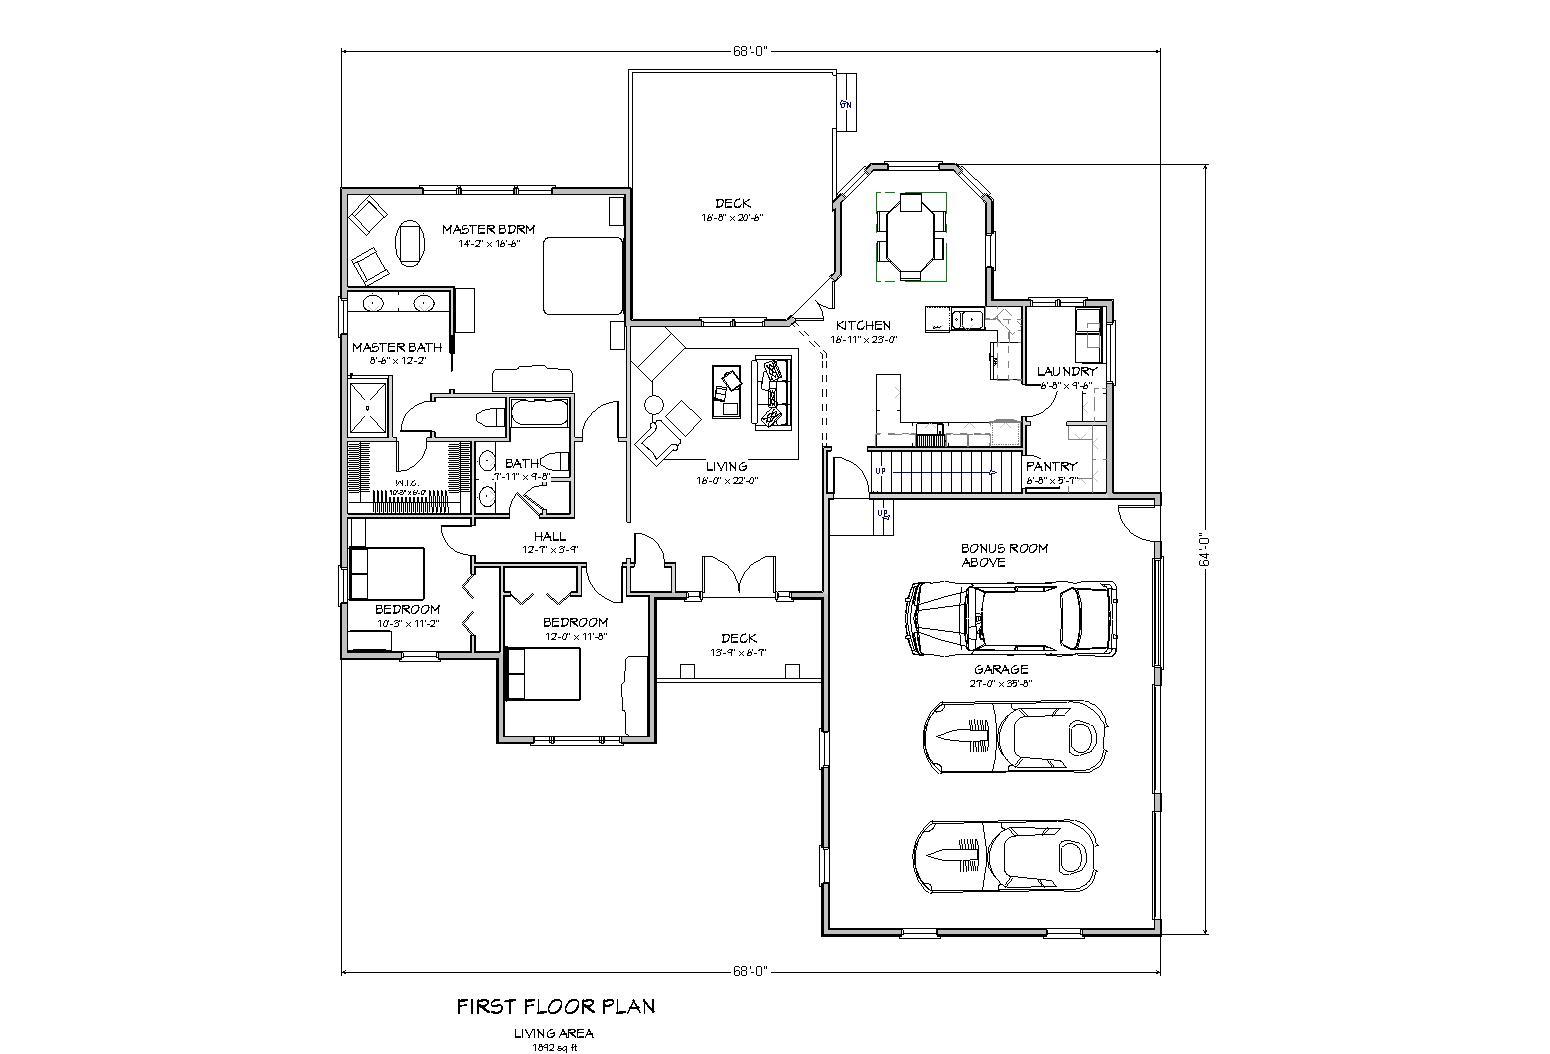 3 Bedroom Ranch Floor Plans Two Bedroom Ranch House Plans. 3 Bedroom Ranch Floor Plans   Paigeandbryan com